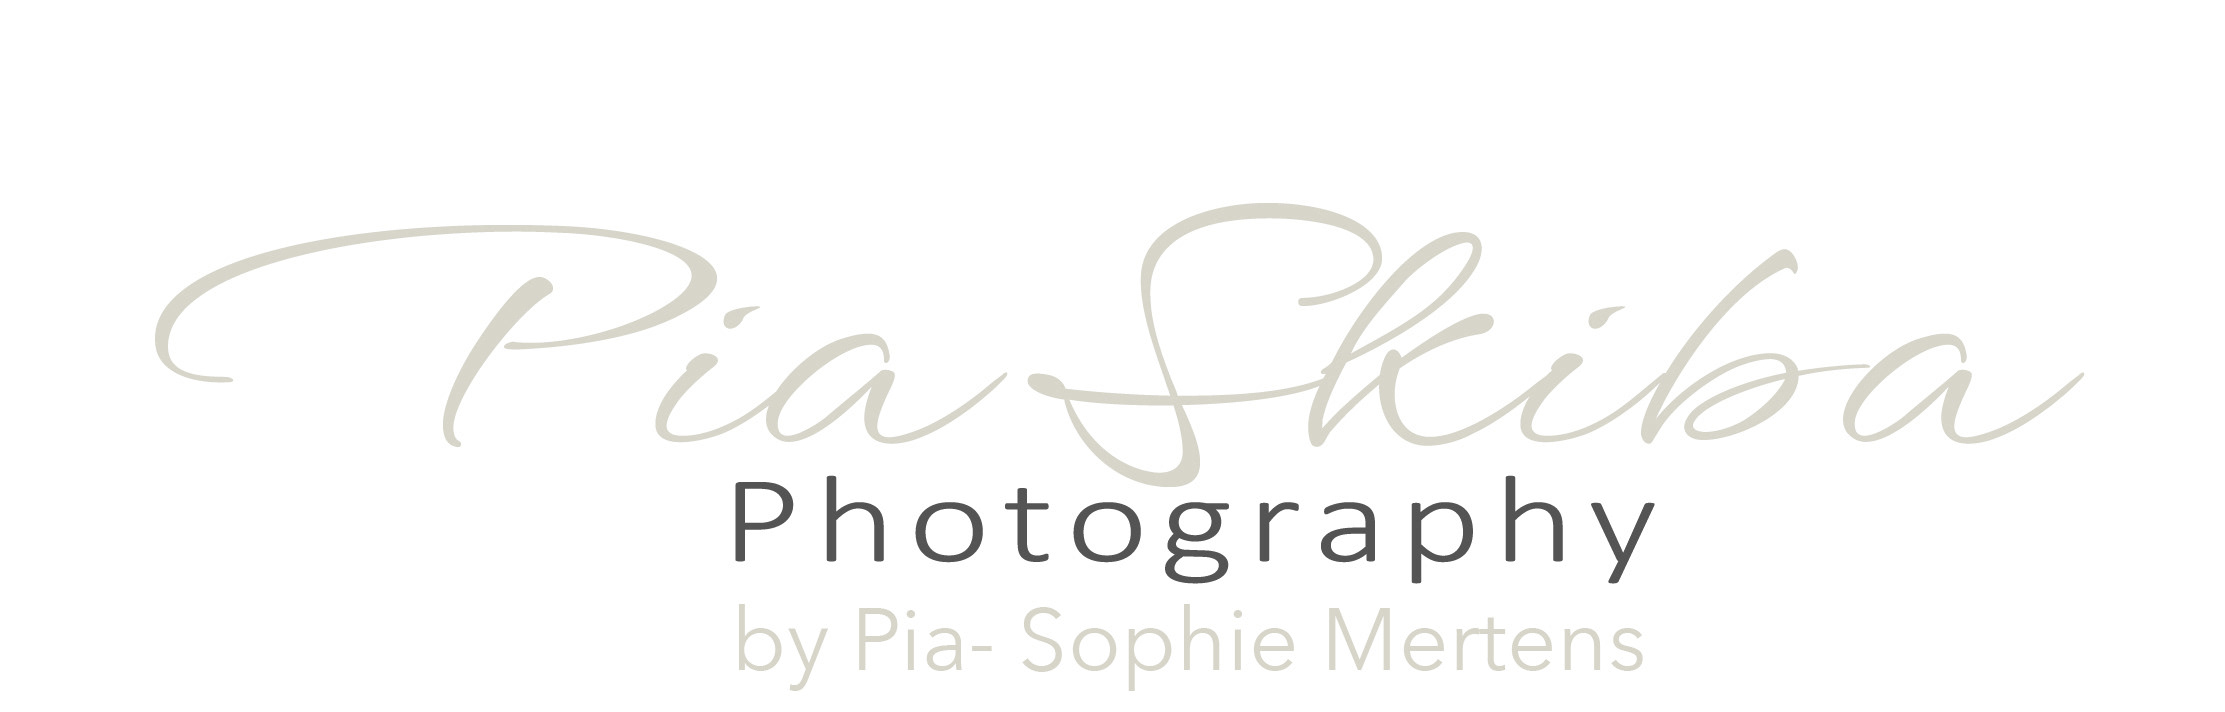 Pia Skiba Photography I Pia Mertens